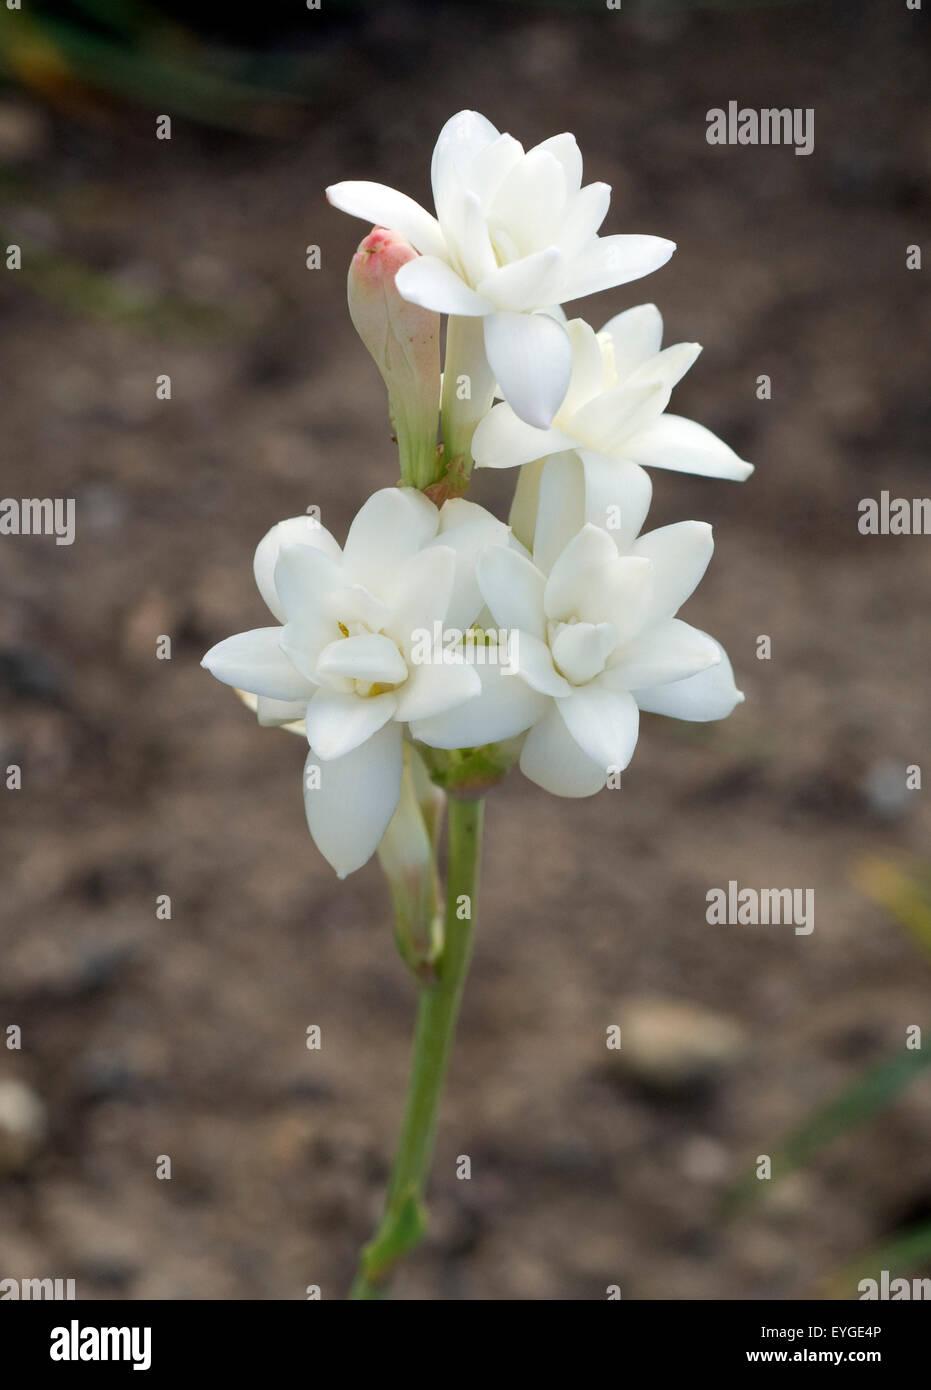 White Tuberose Flowers Stock Photos White Tuberose Flowers Stock